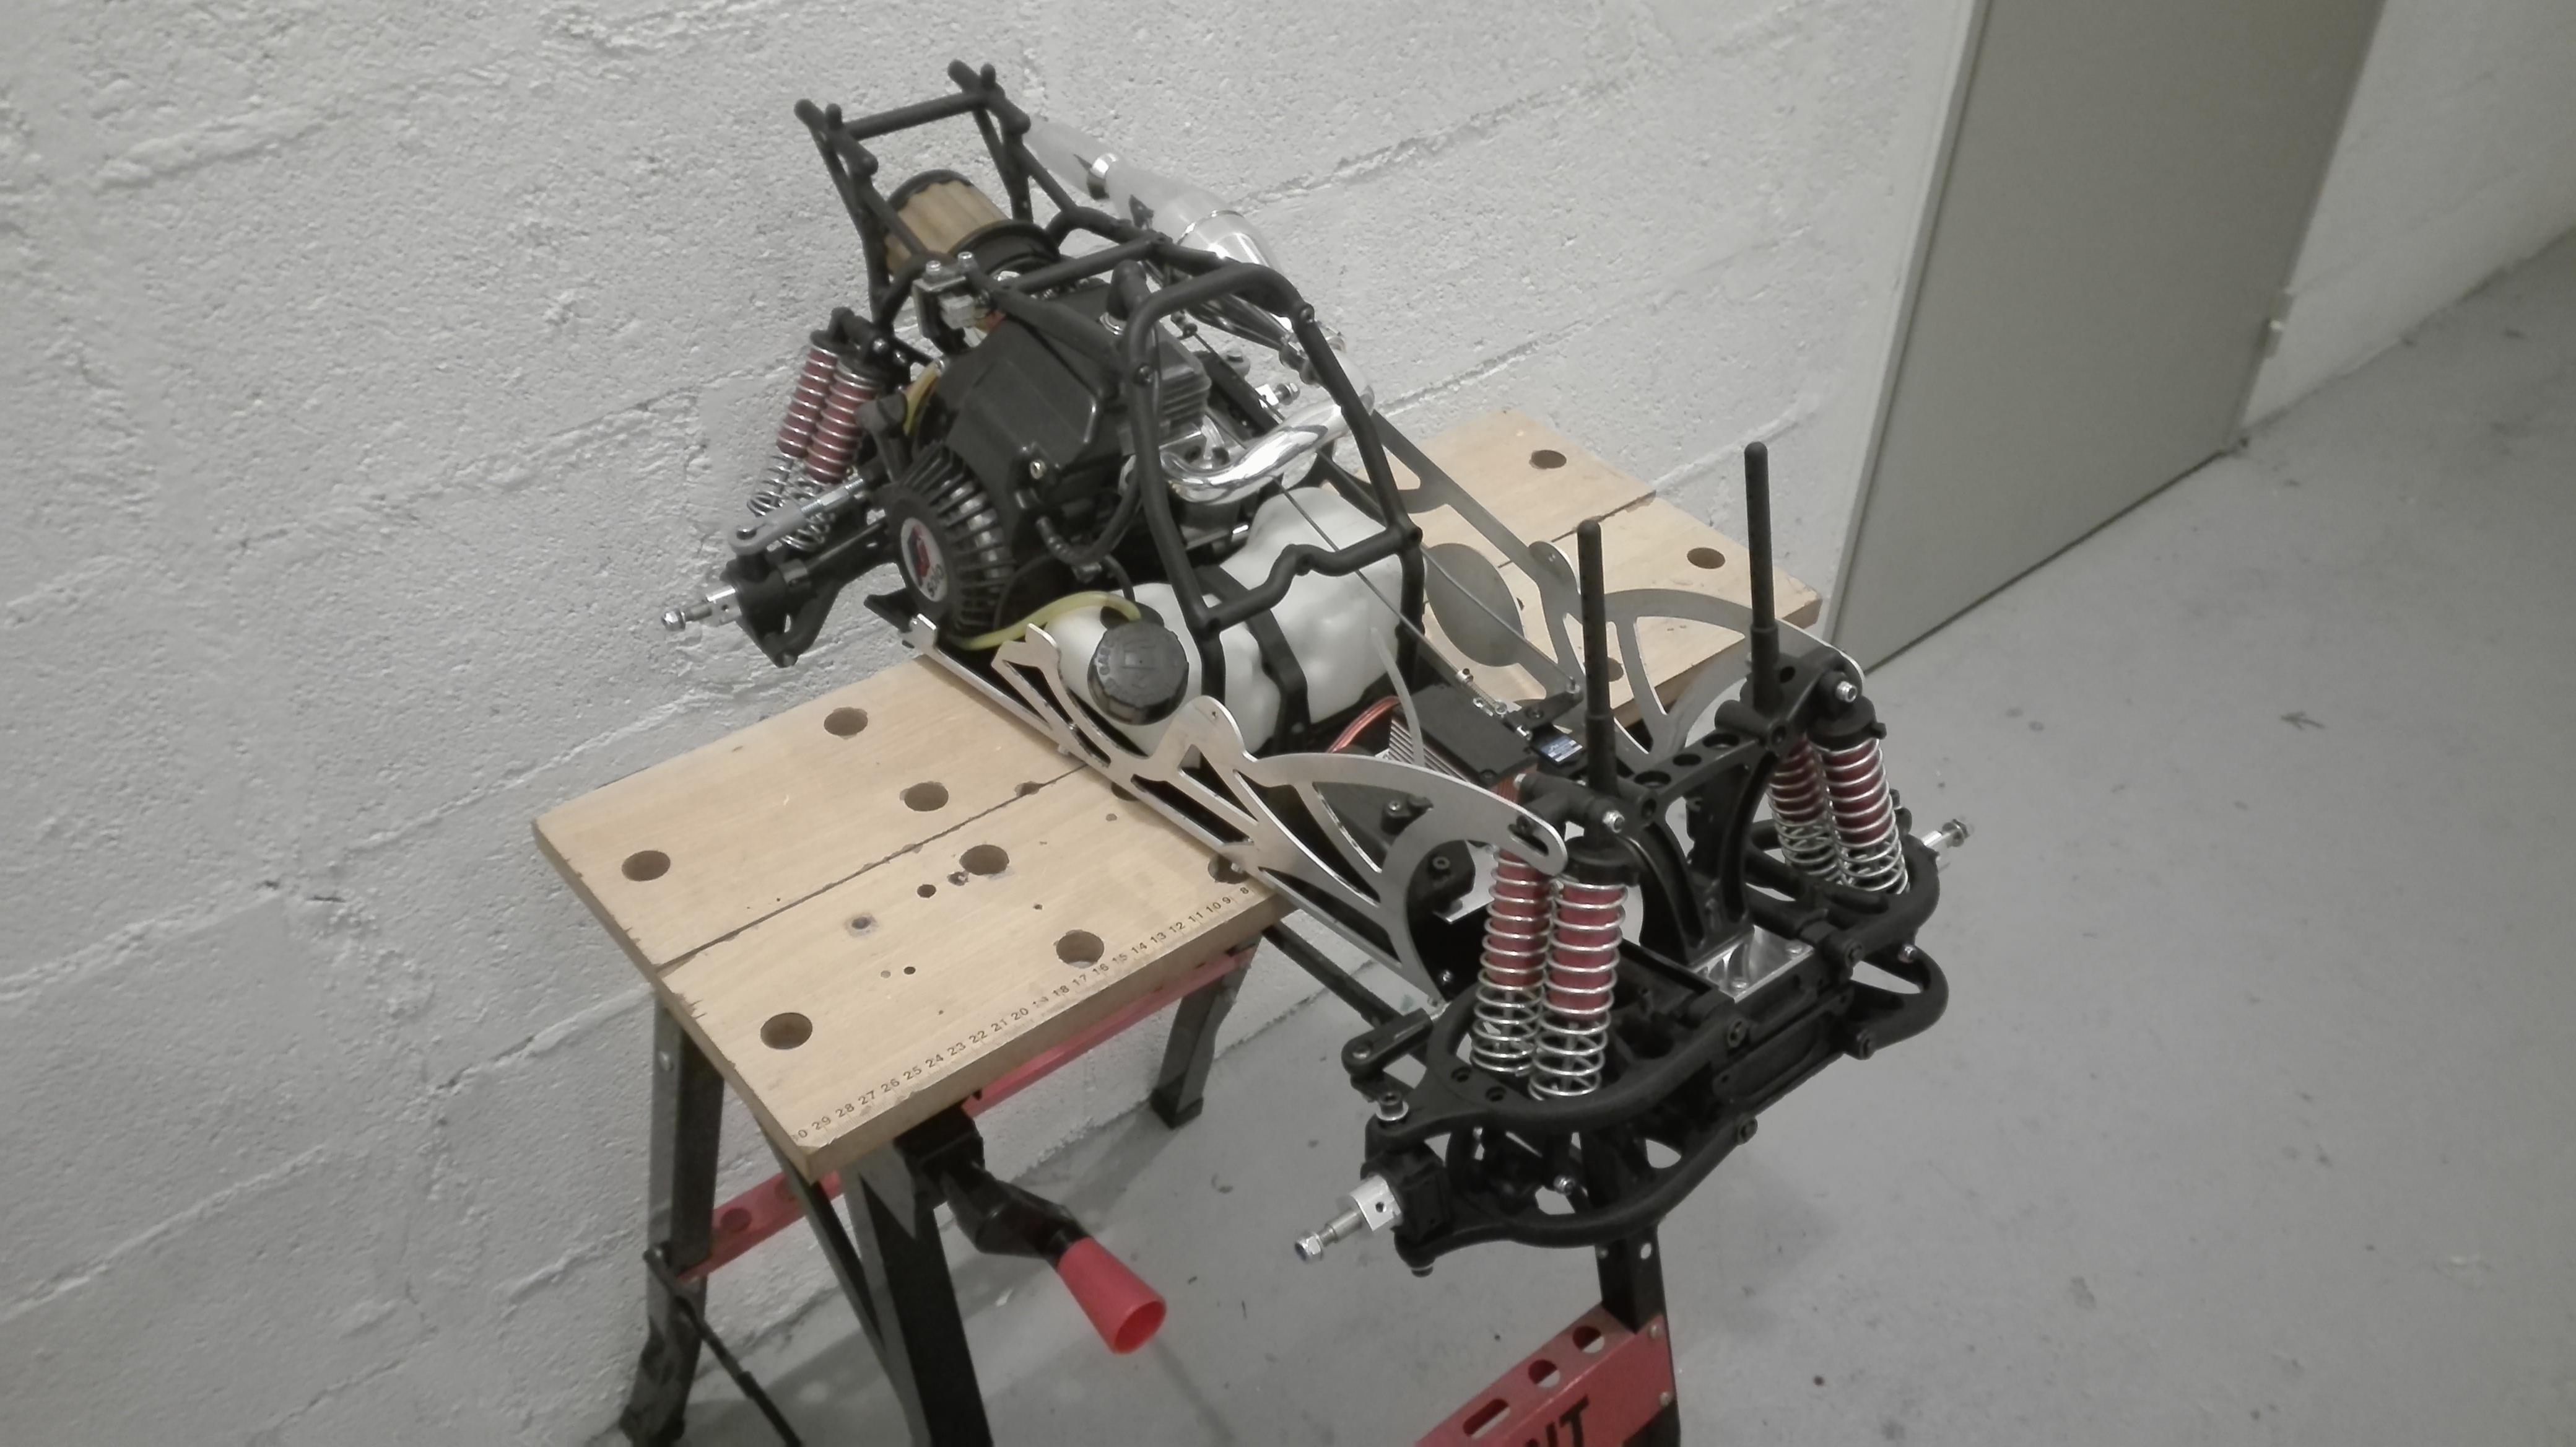 re-montage complet monster truck FG depuis un chassis nu - Page 2 180303061535823262